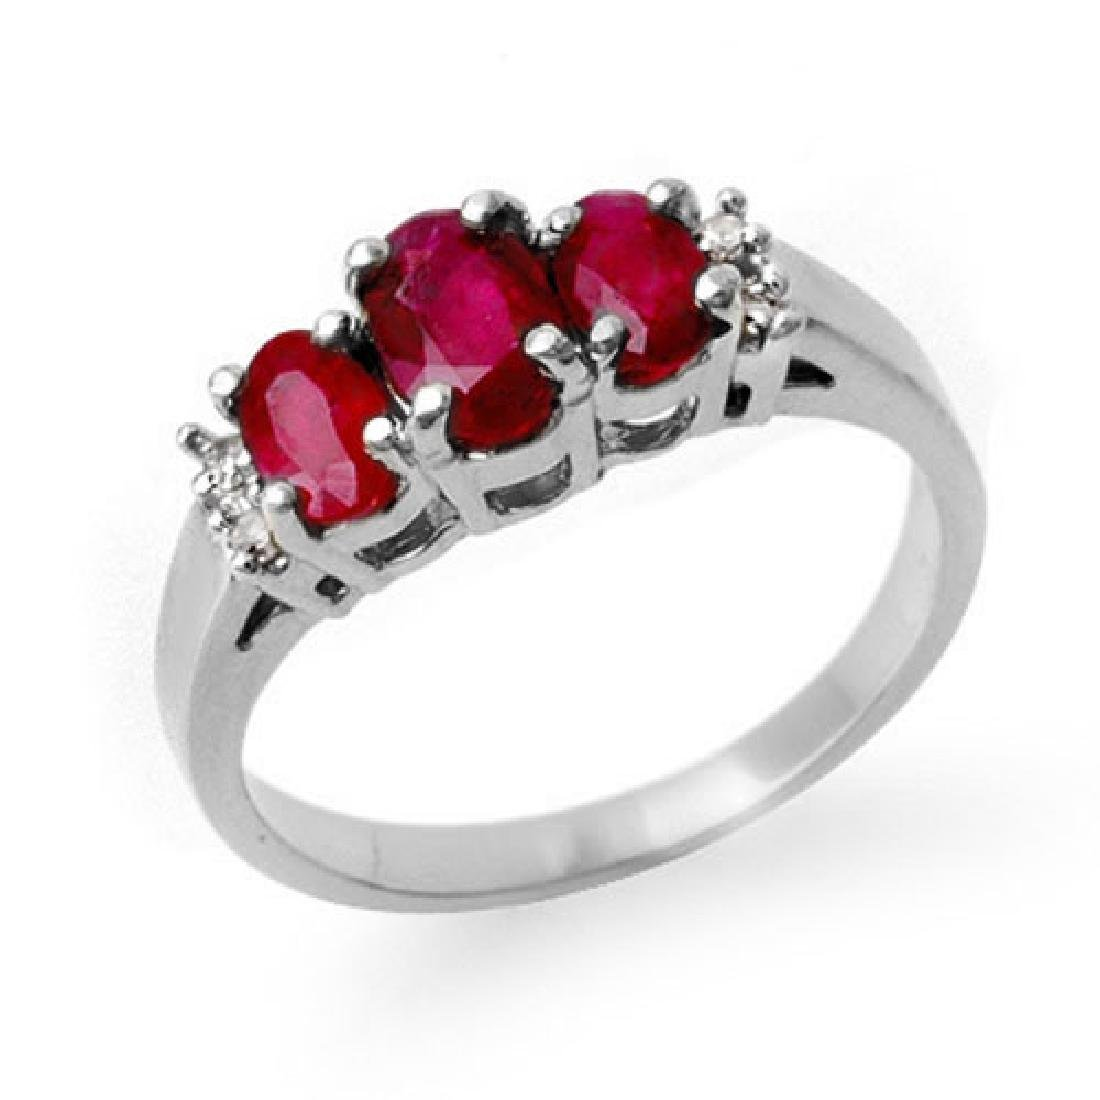 1.18 CTW Ruby & Diamond Ring 18K White Gold